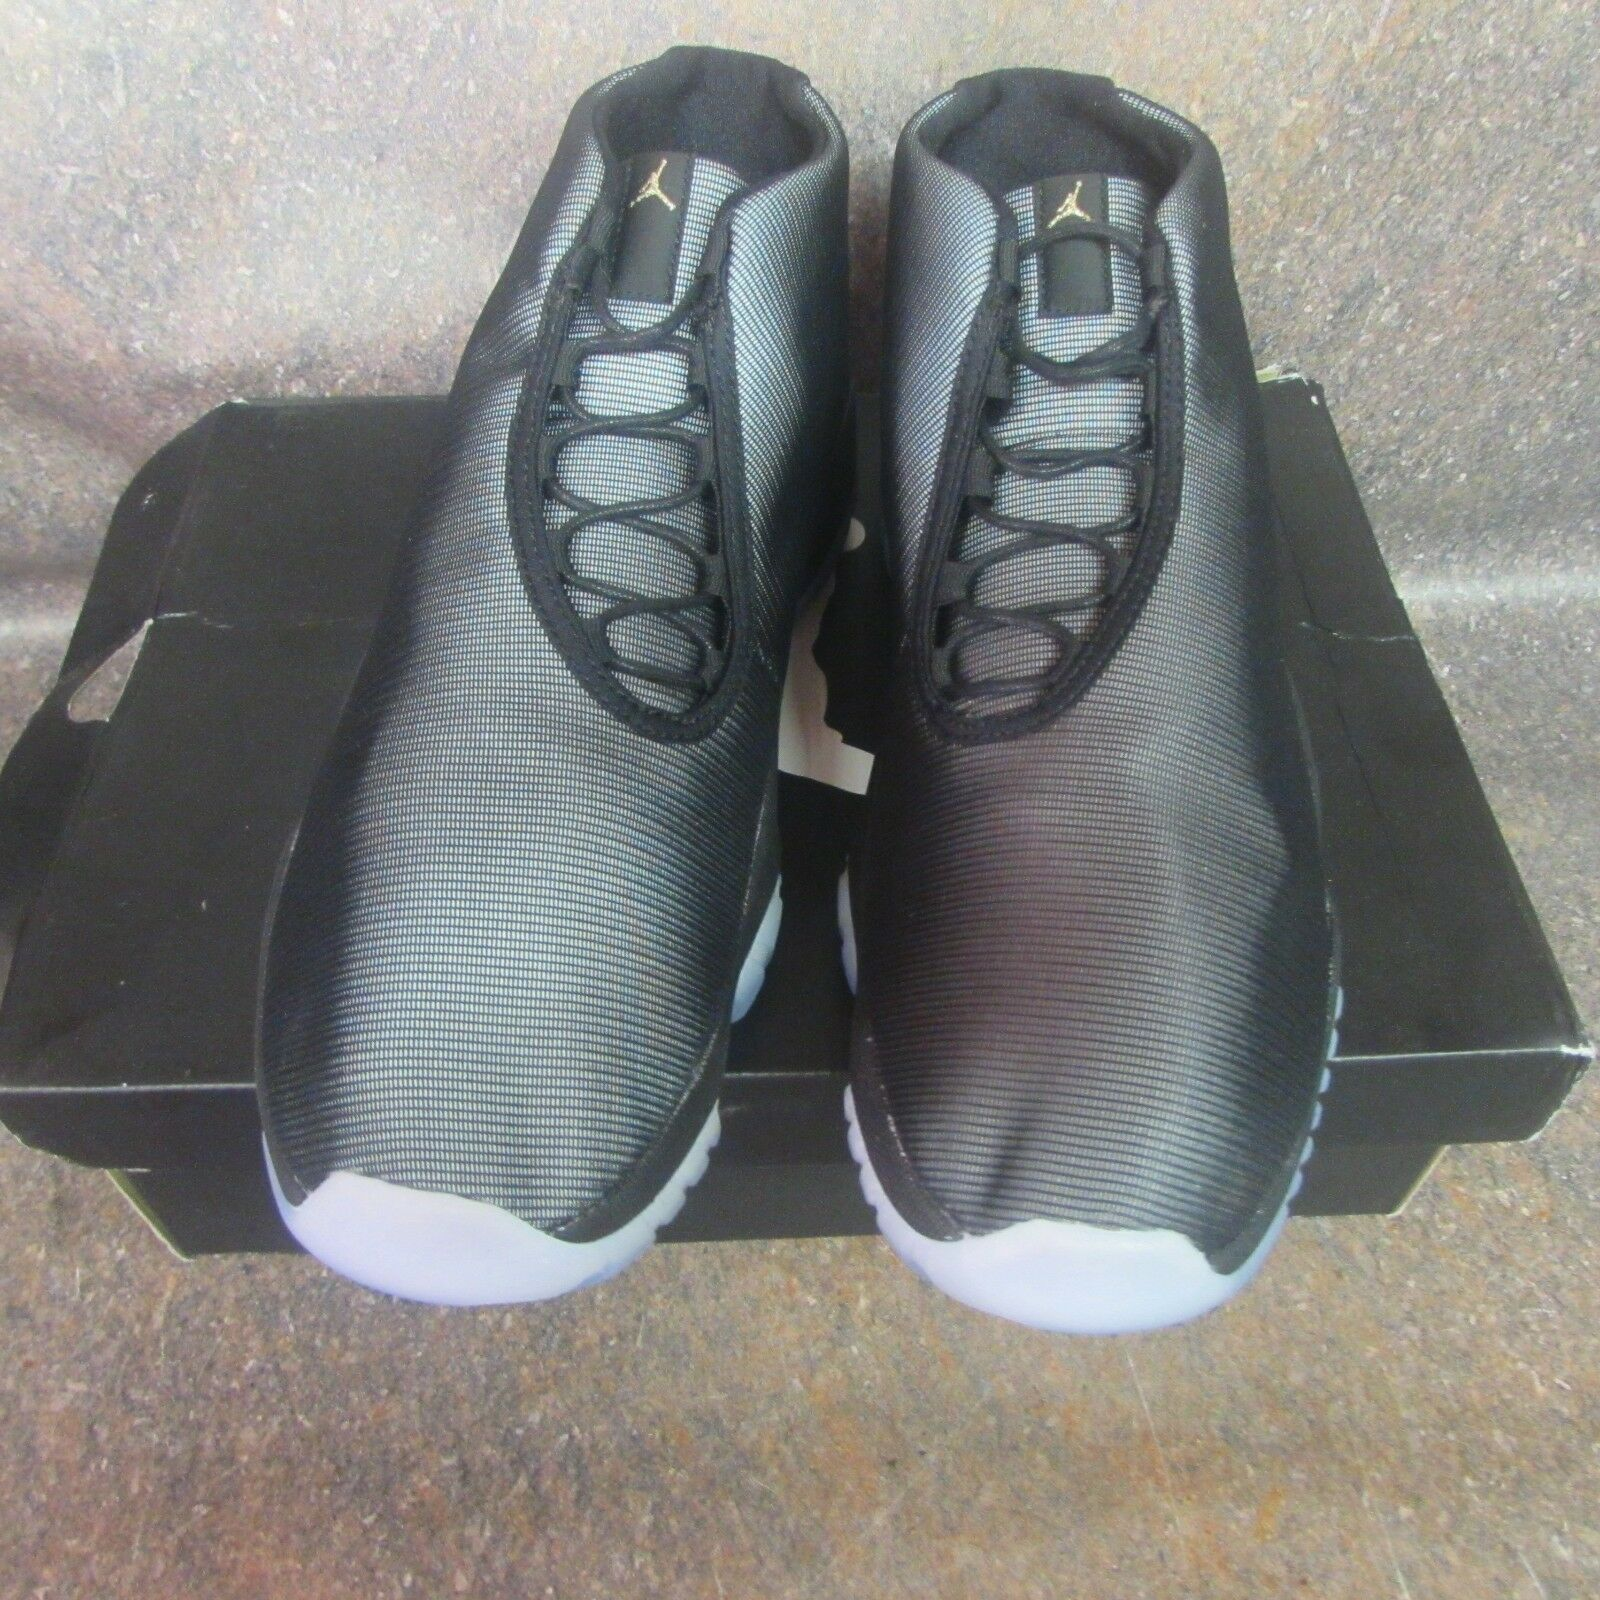 Nike Air Jordan Future Black Clear 3M Reflective Glow Size 12 (6C)